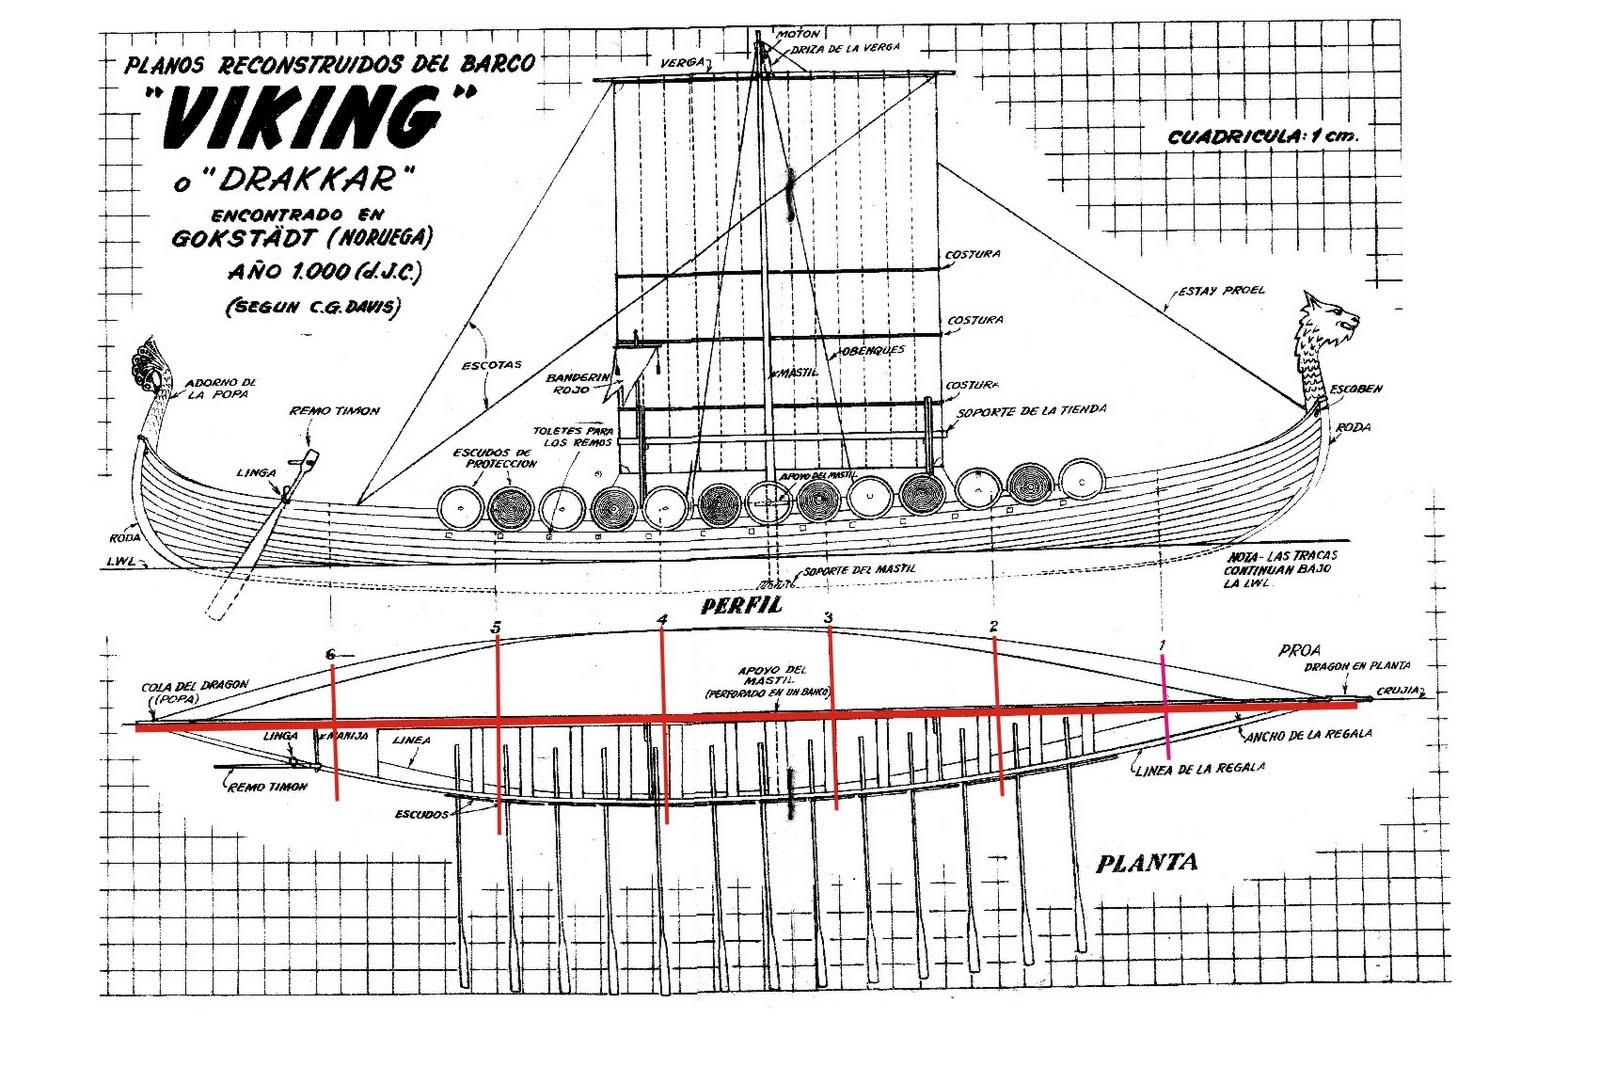 modelismo naval y a u00e9reo